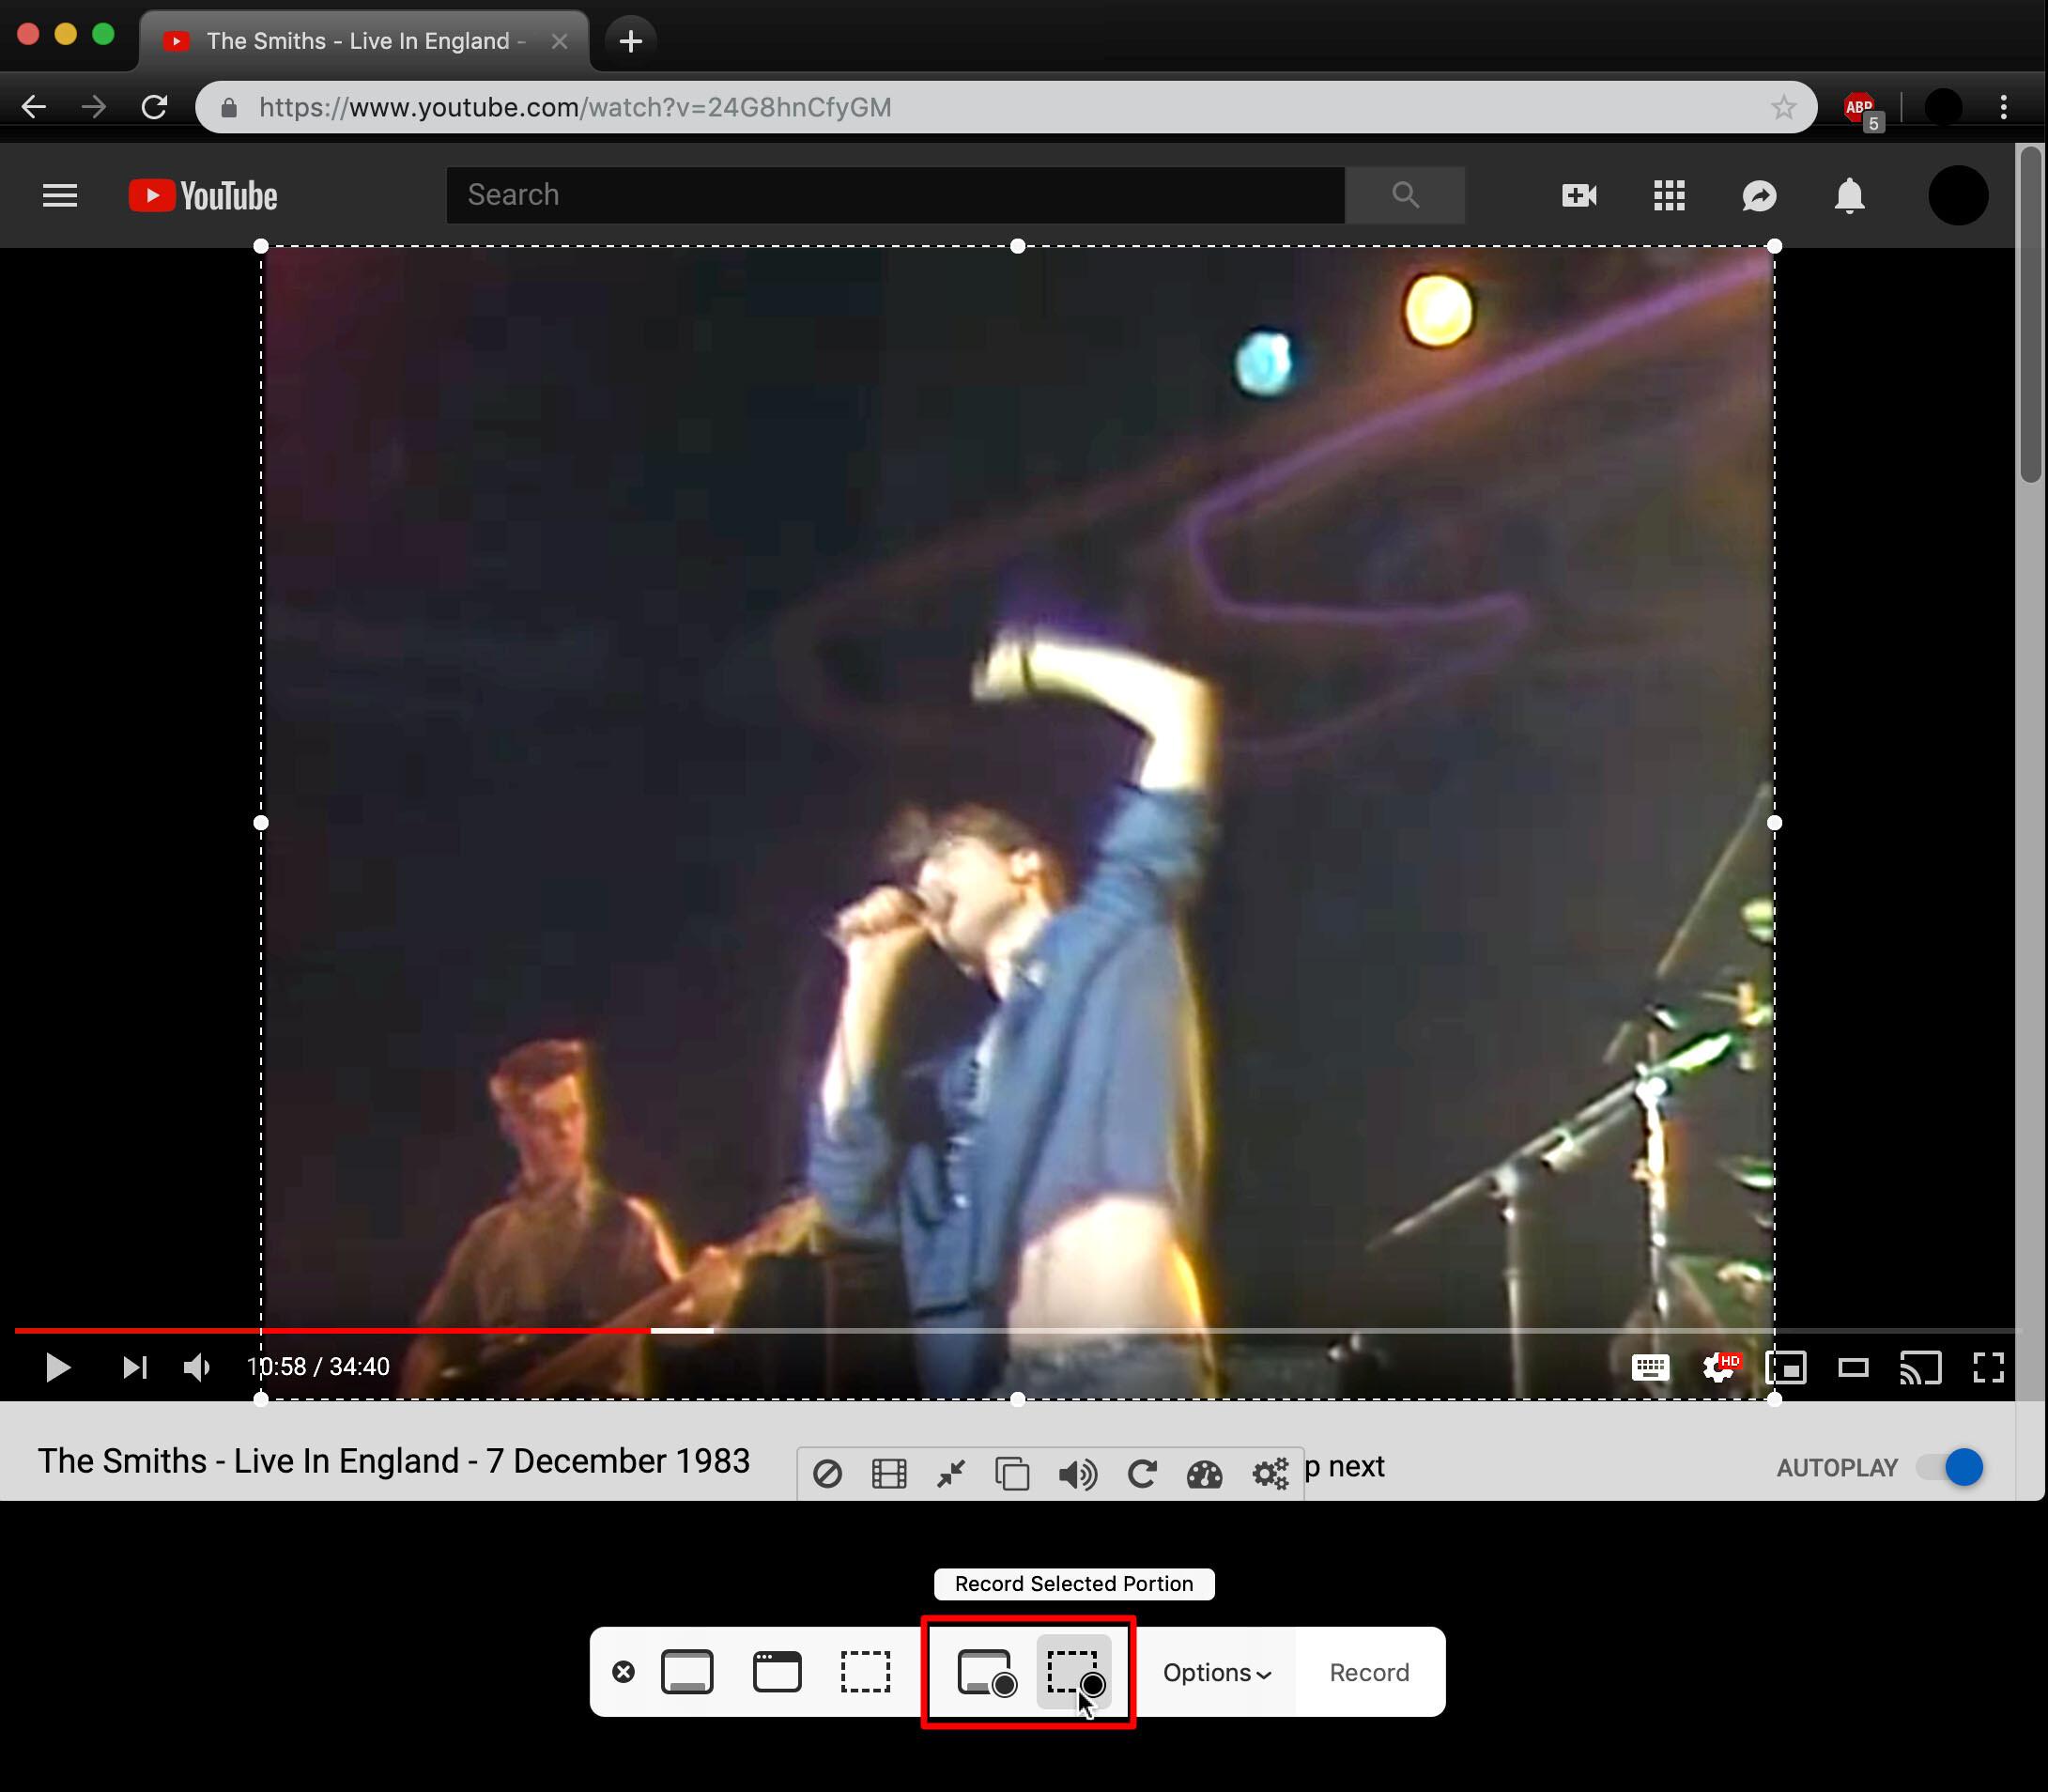 6. Cara Screen Record MacBook